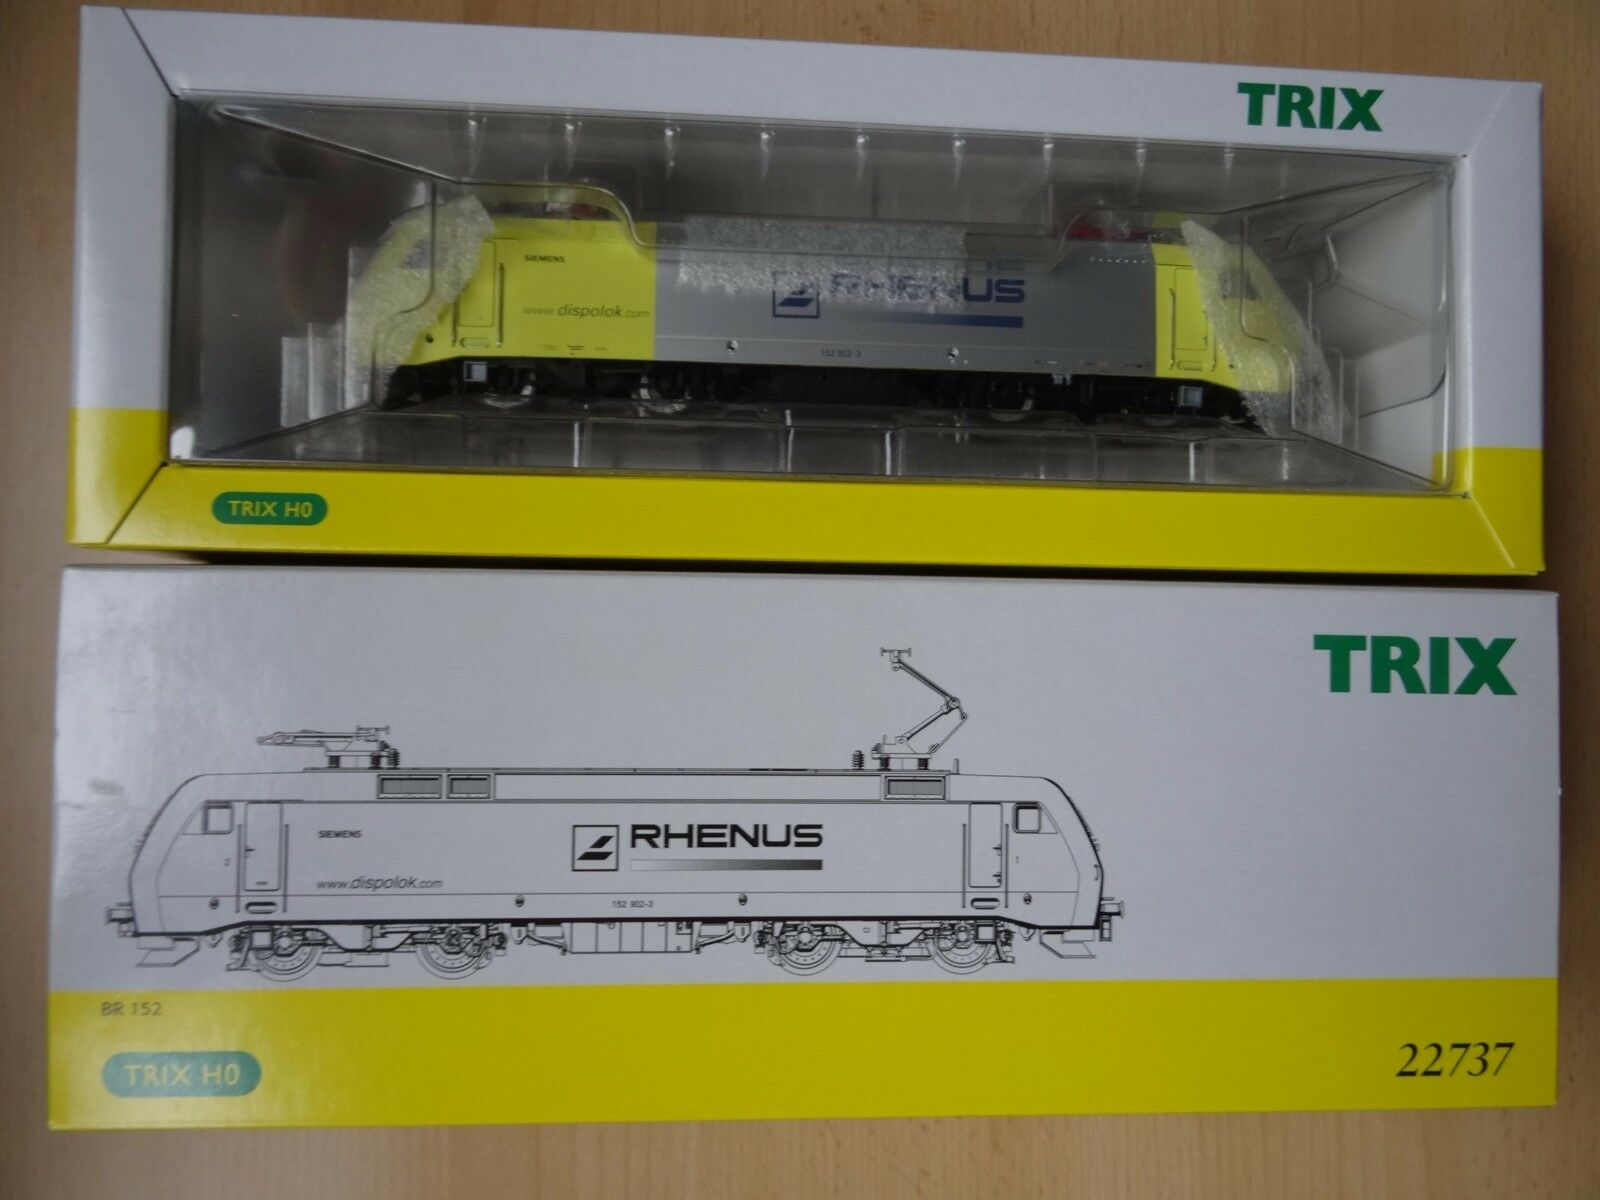 Trix  Artikel HO    22737  E-Lok BR 152  Rhenus   - Neuware aus Ladenauflösung  | Economy  191e0d